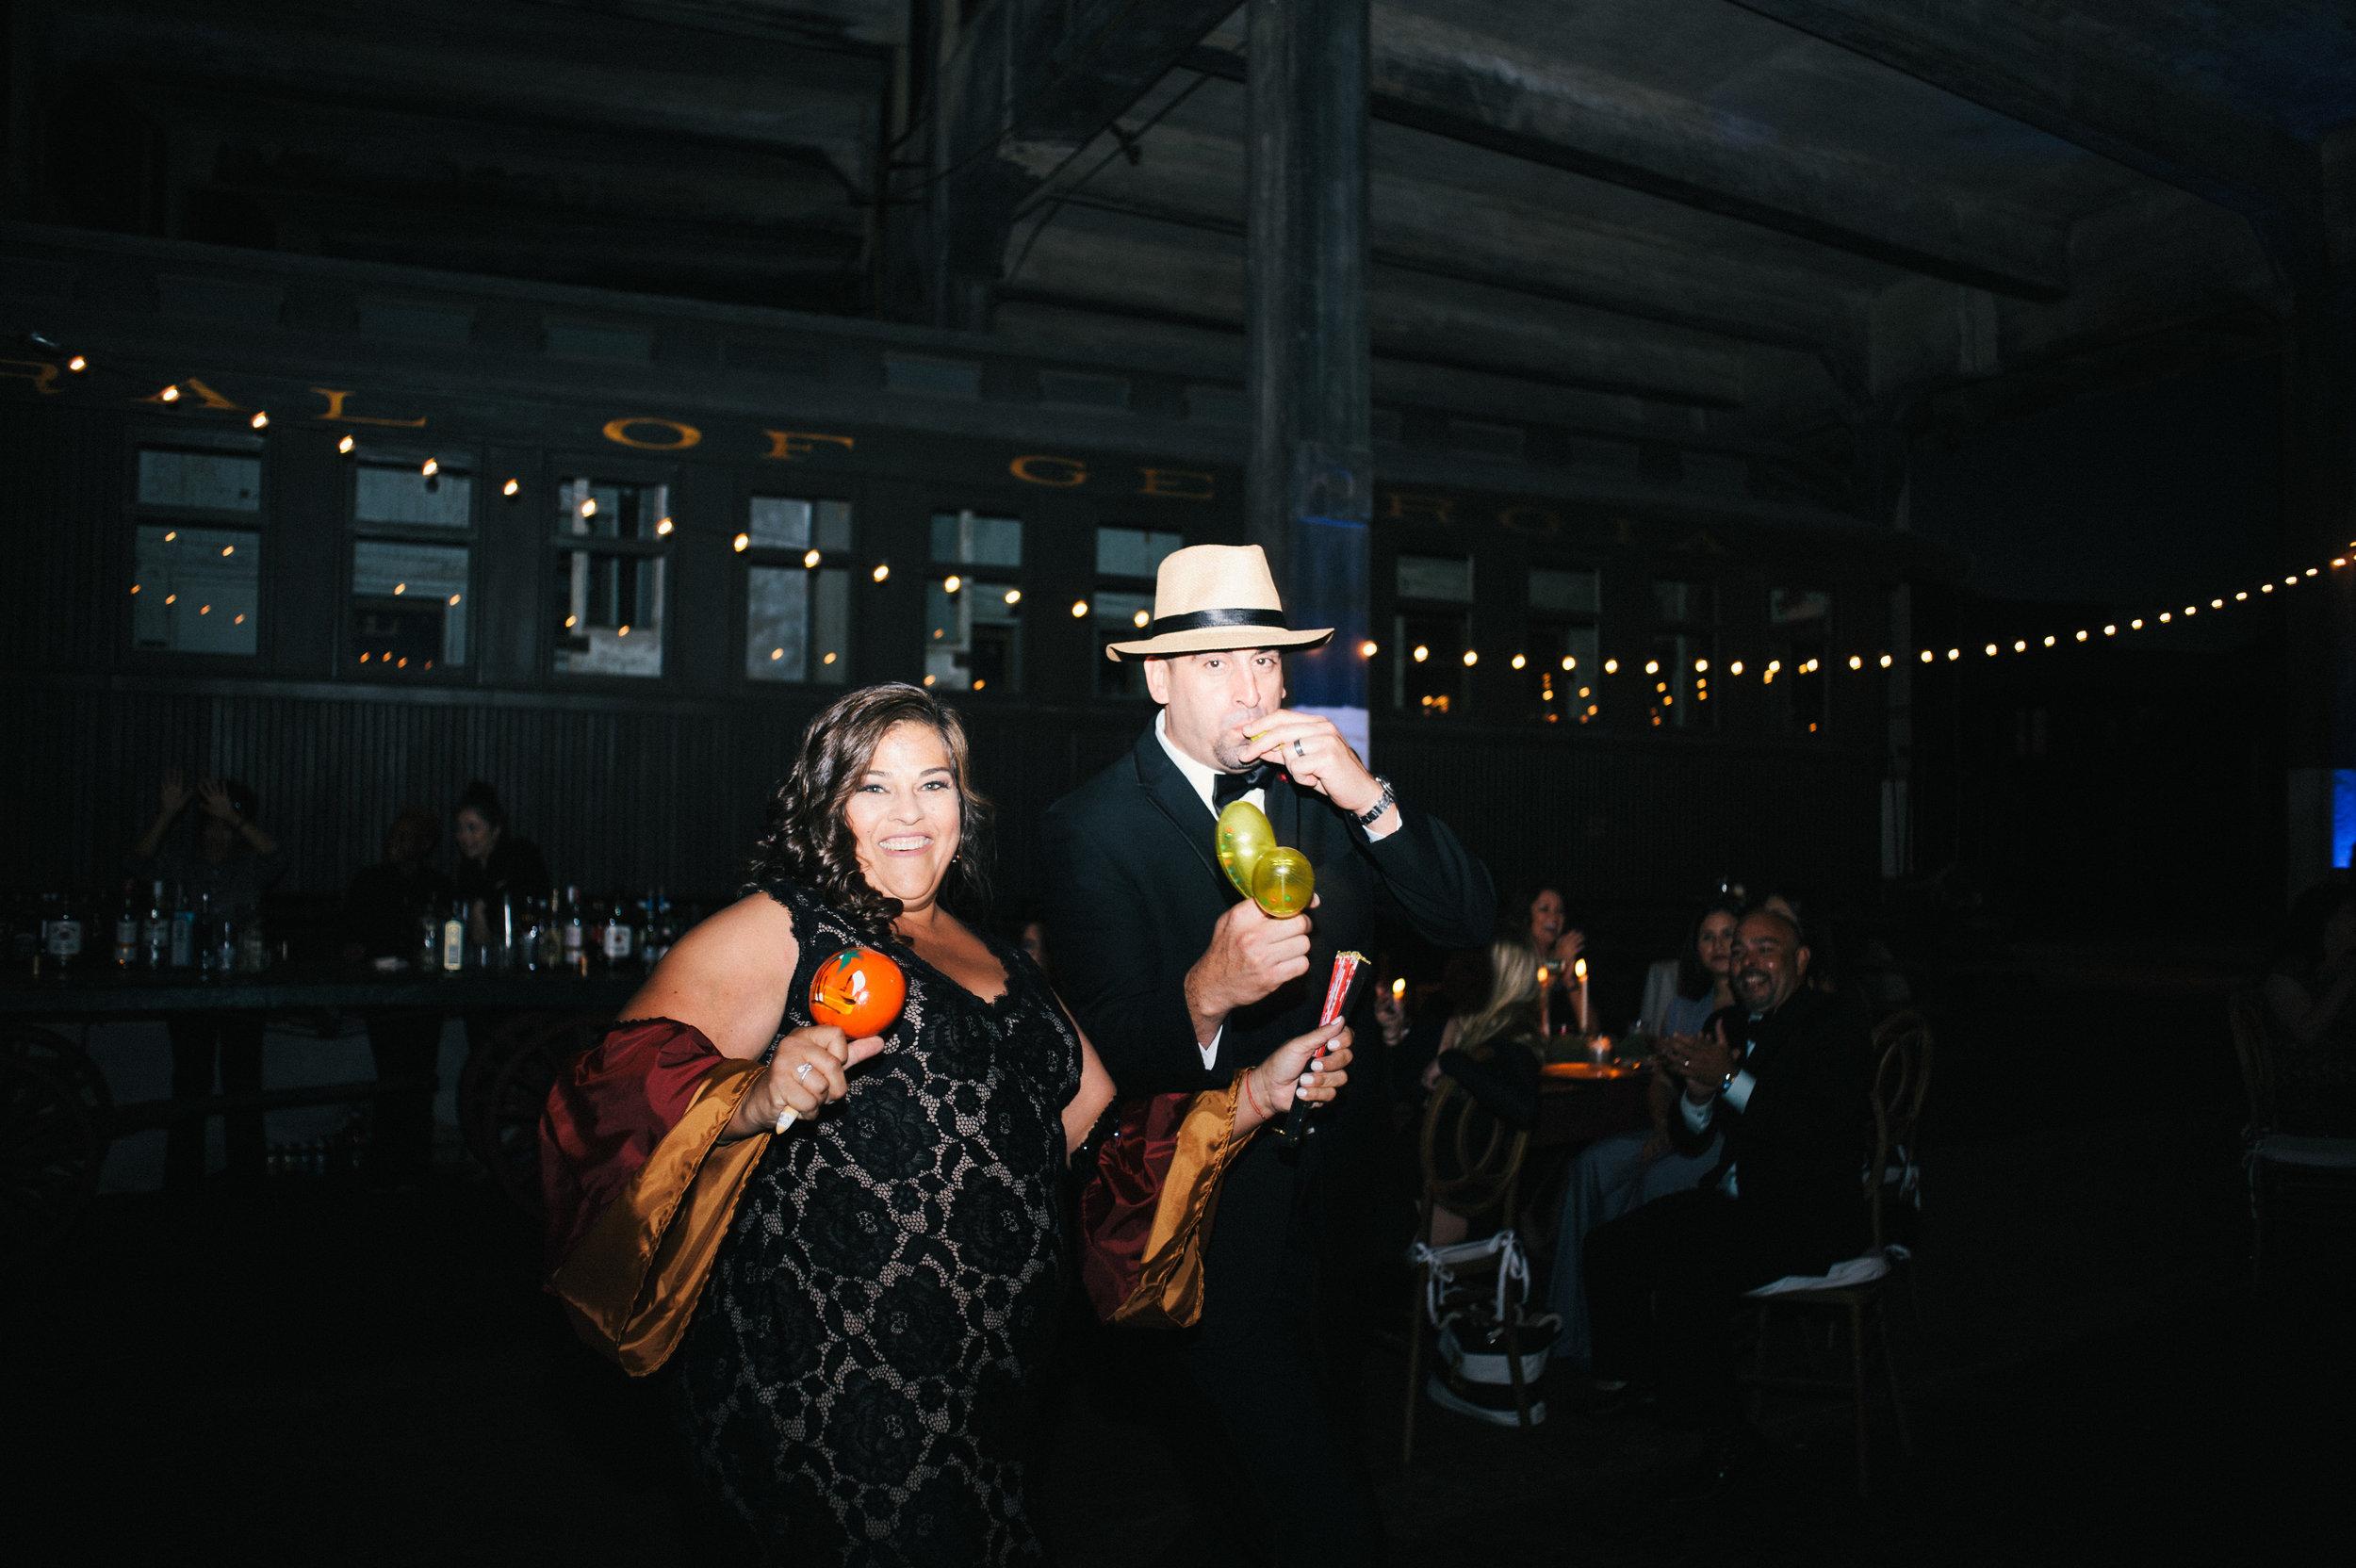 Iggy-and-yesenia-savannah-railroad-museum-wedding-meg-hill-photo- (677 of 866).jpg